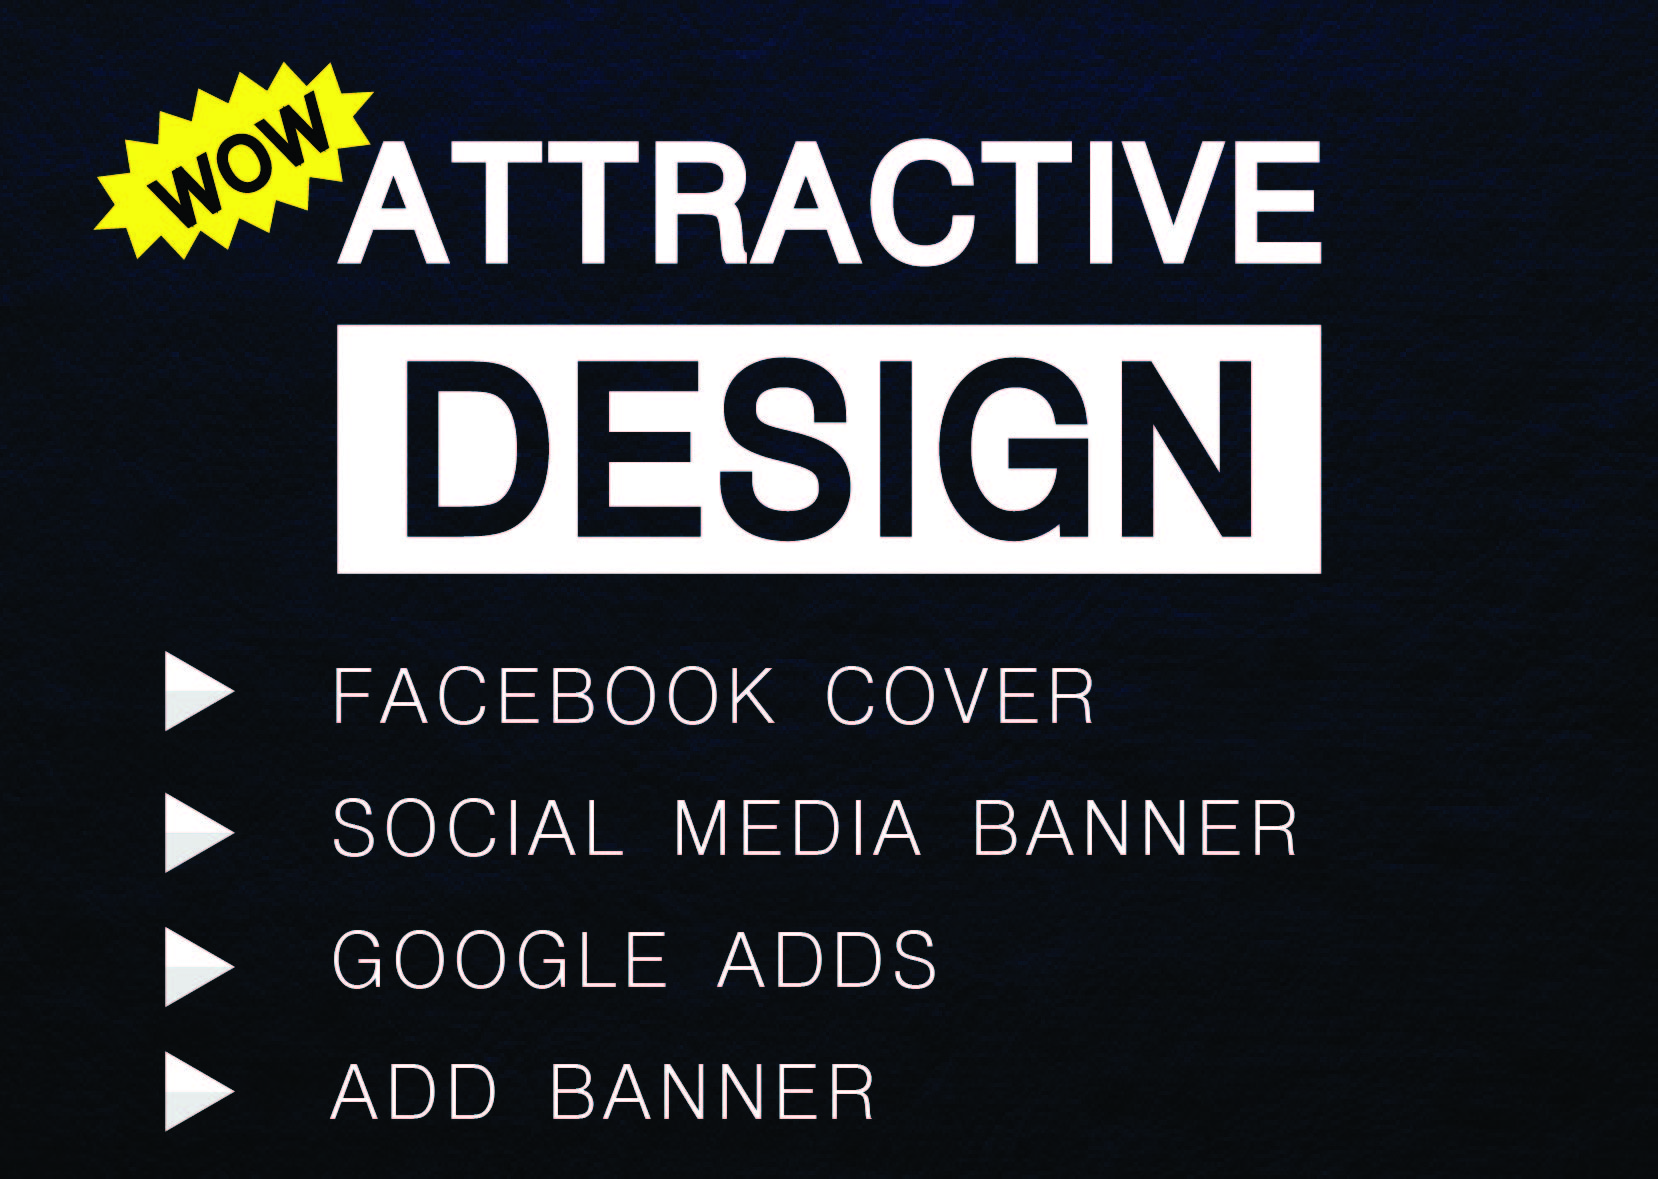 I will create 3 unique Social post and Facebook cover design